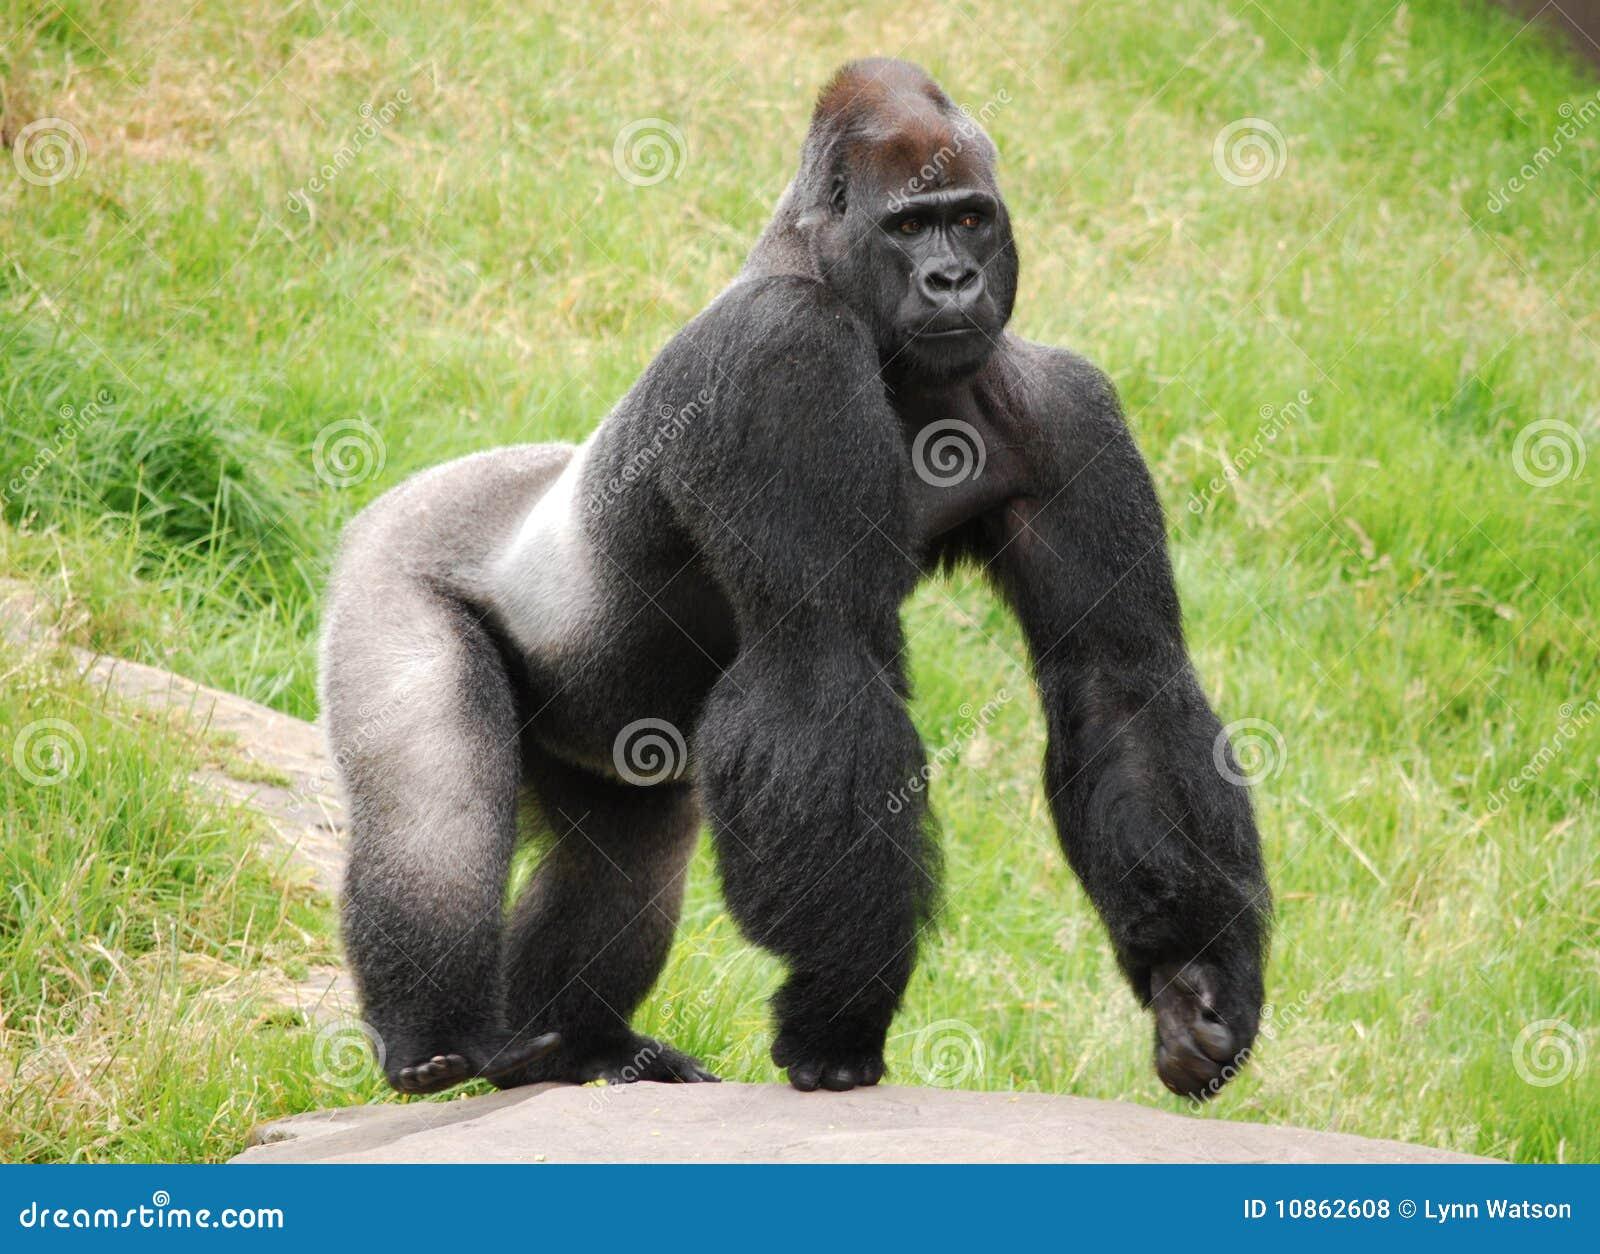 foto-penisa-gorilli